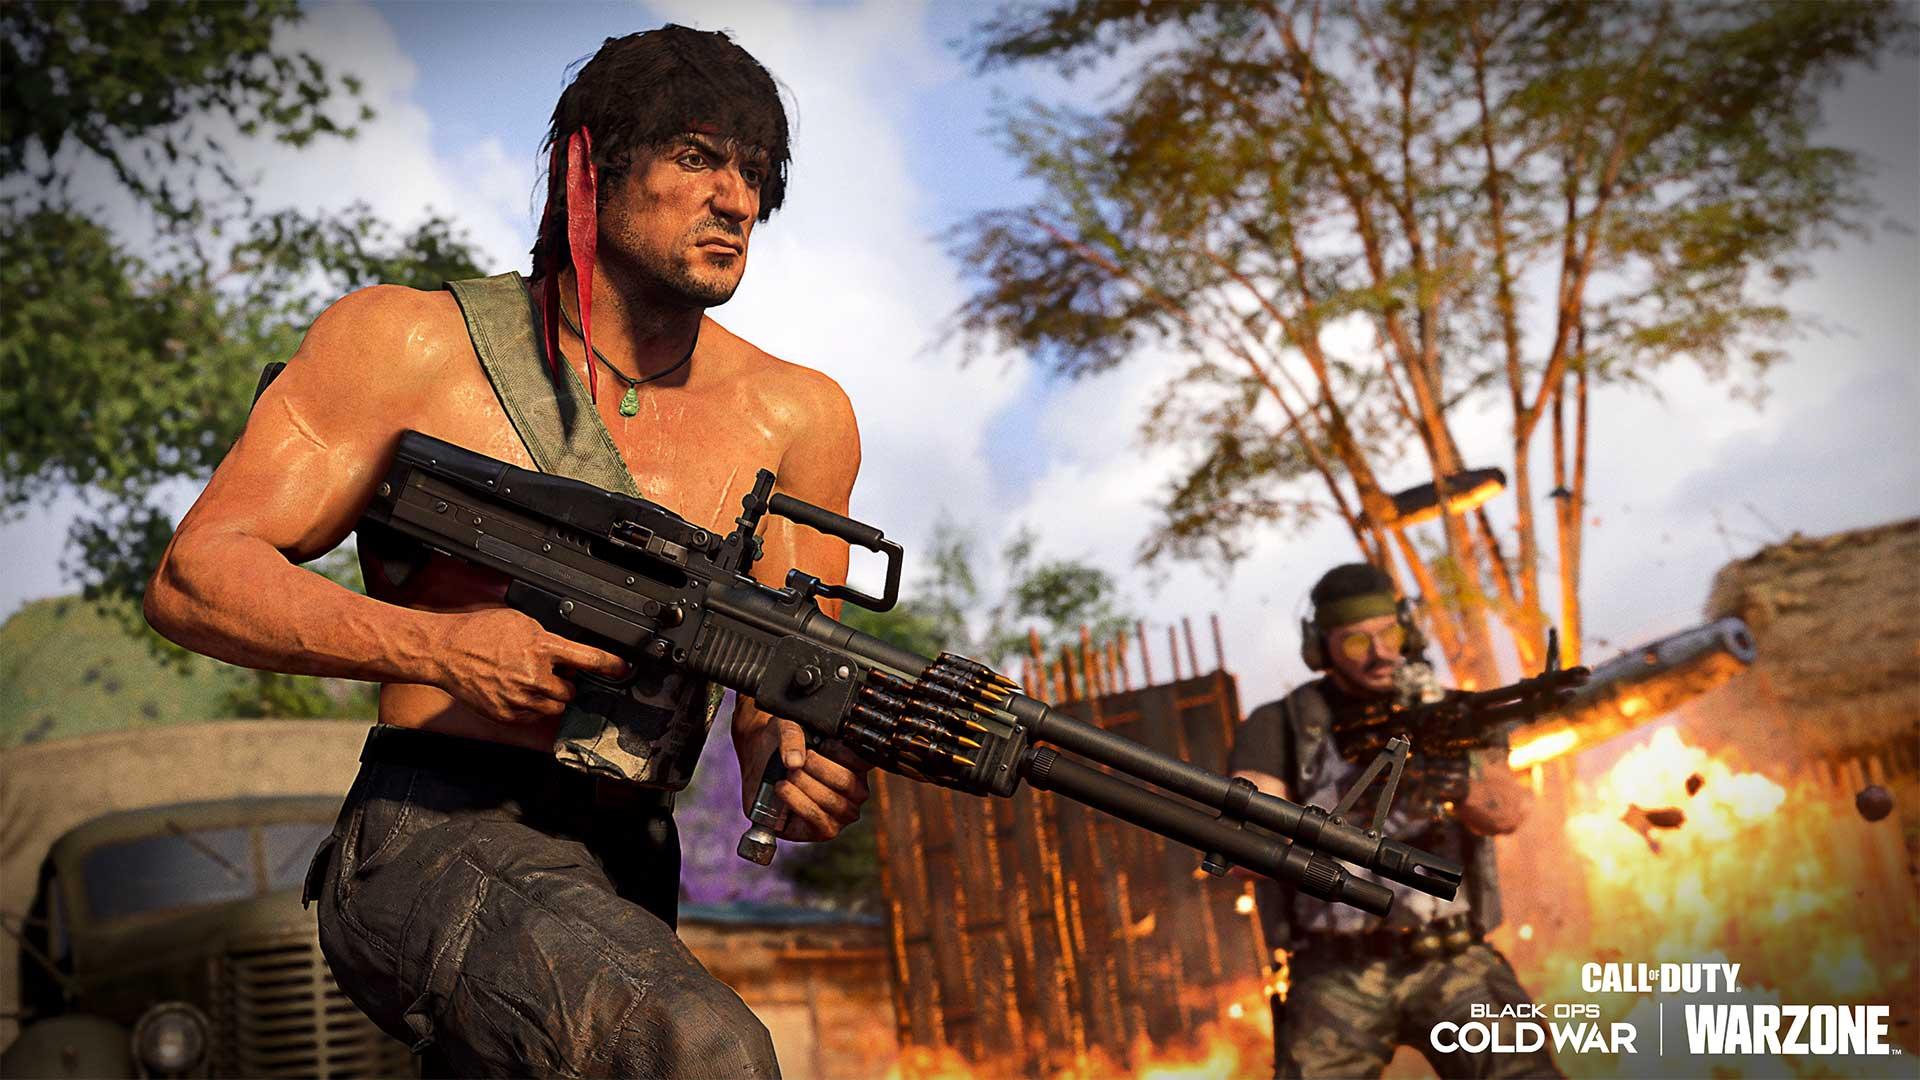 Rambo y John McClane debutan en Call of Duty: Black Ops Cold War y Warzone 4